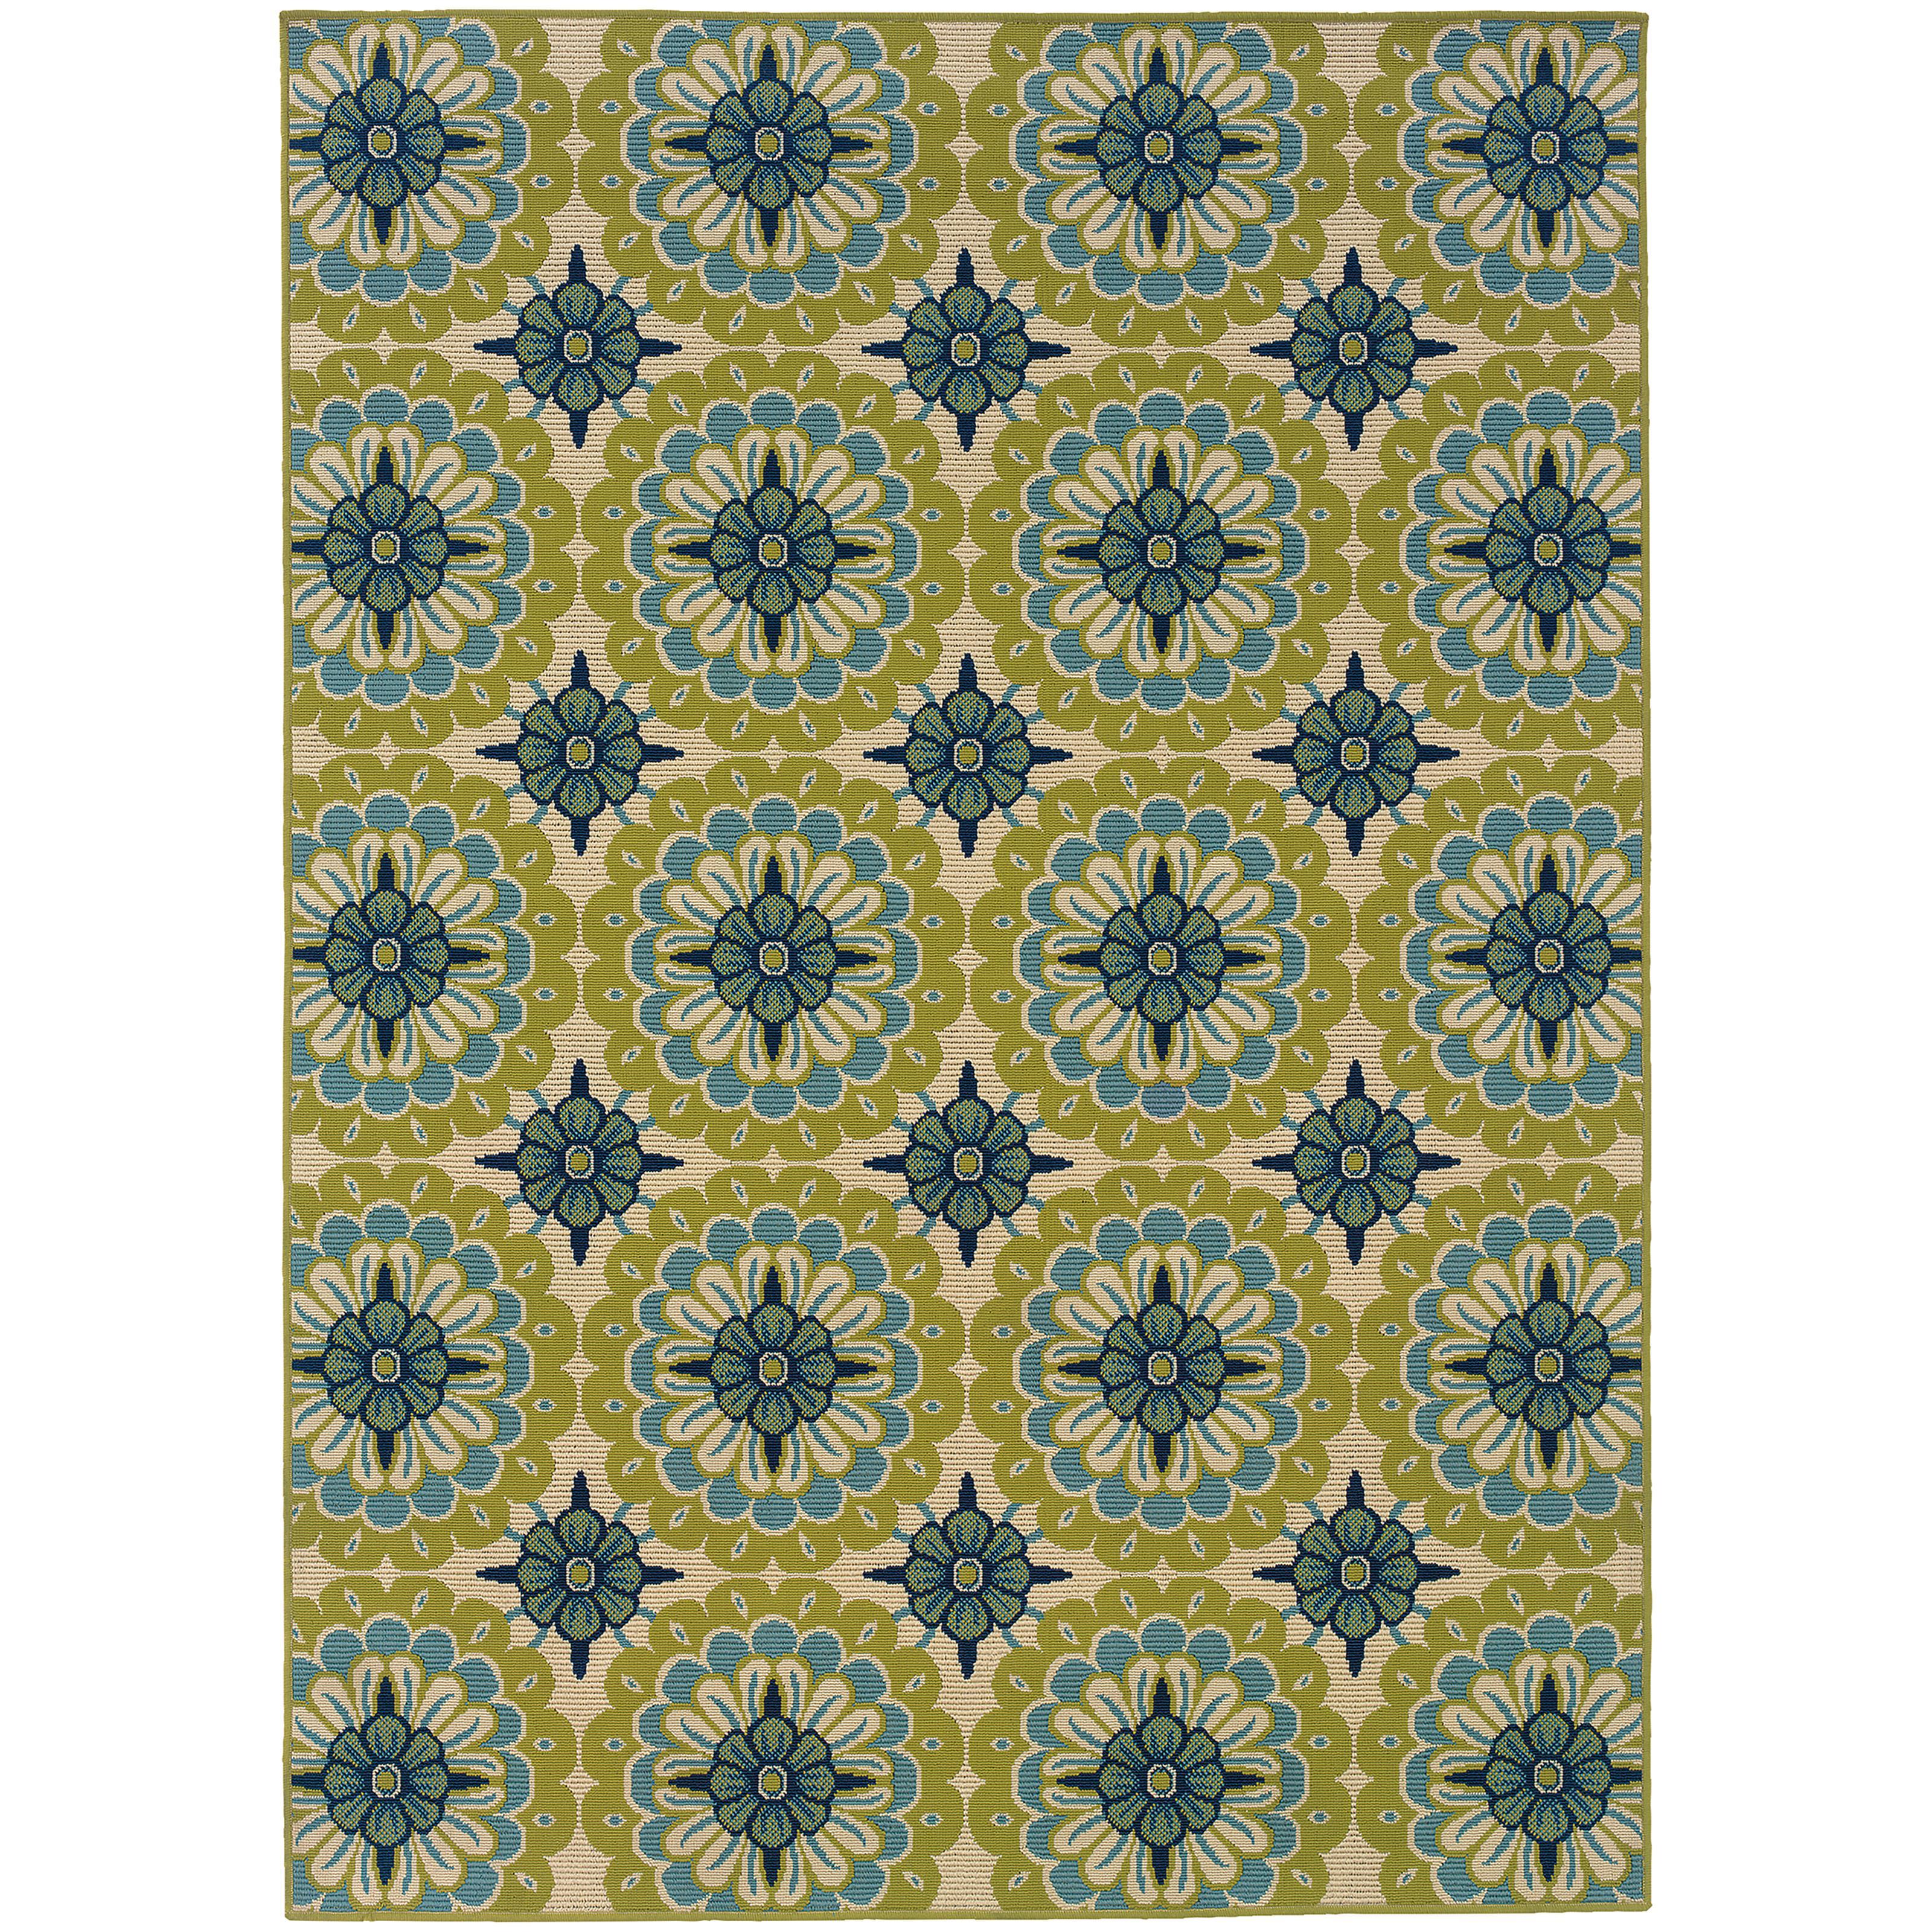 "Caspian 7'10"" X 10'10"" Rug by Oriental Weavers at Steger's Furniture"